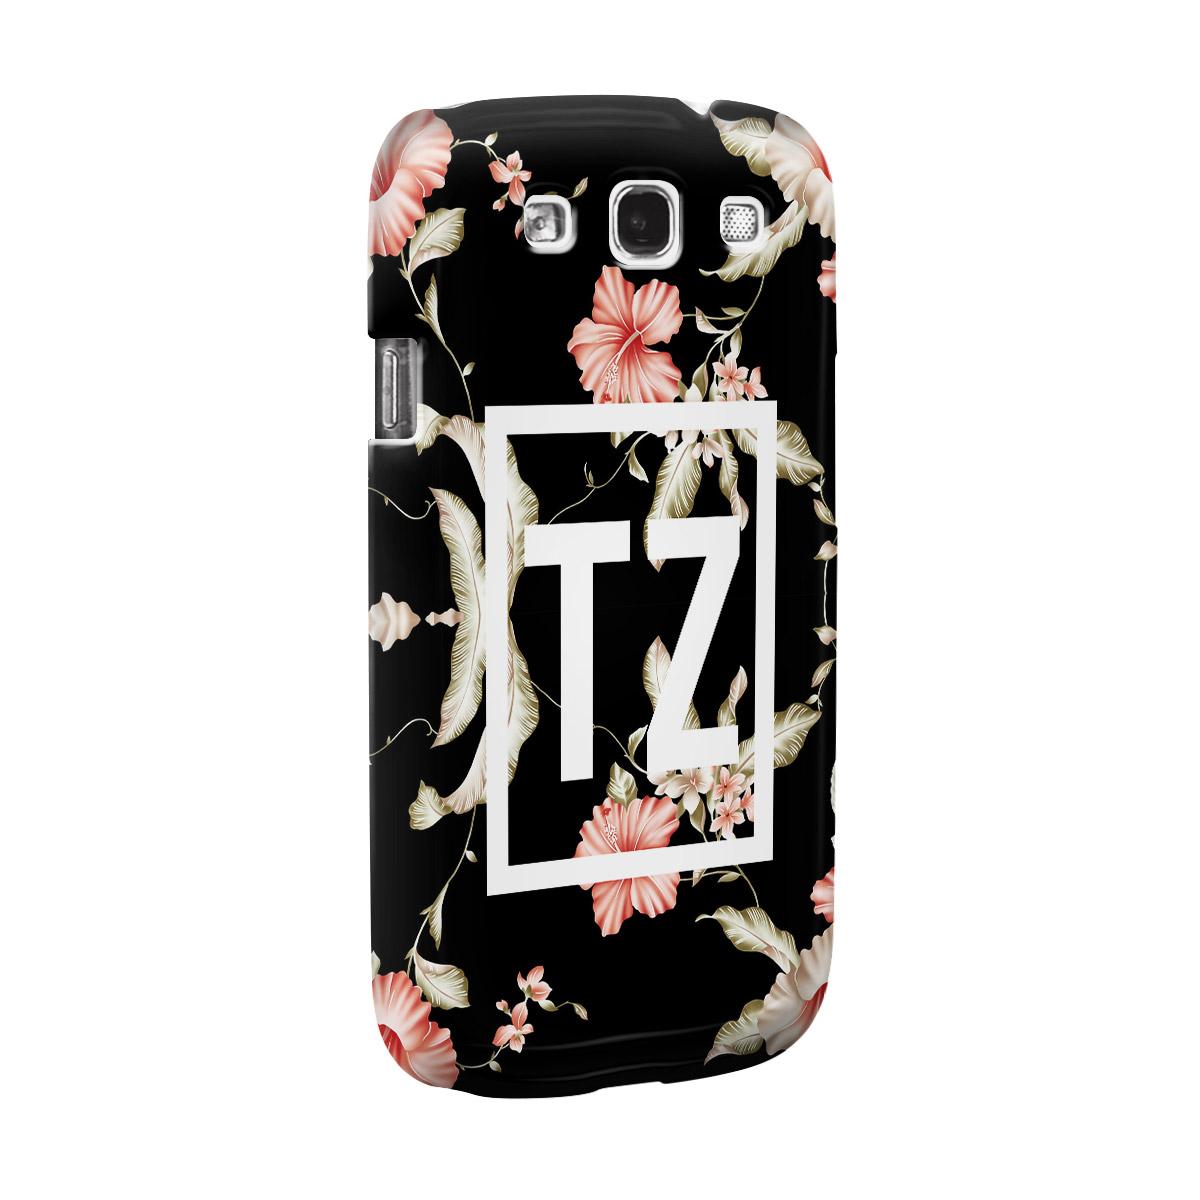 Capa para Samsung Galaxy S3 MC Tati Zaqui Flowers